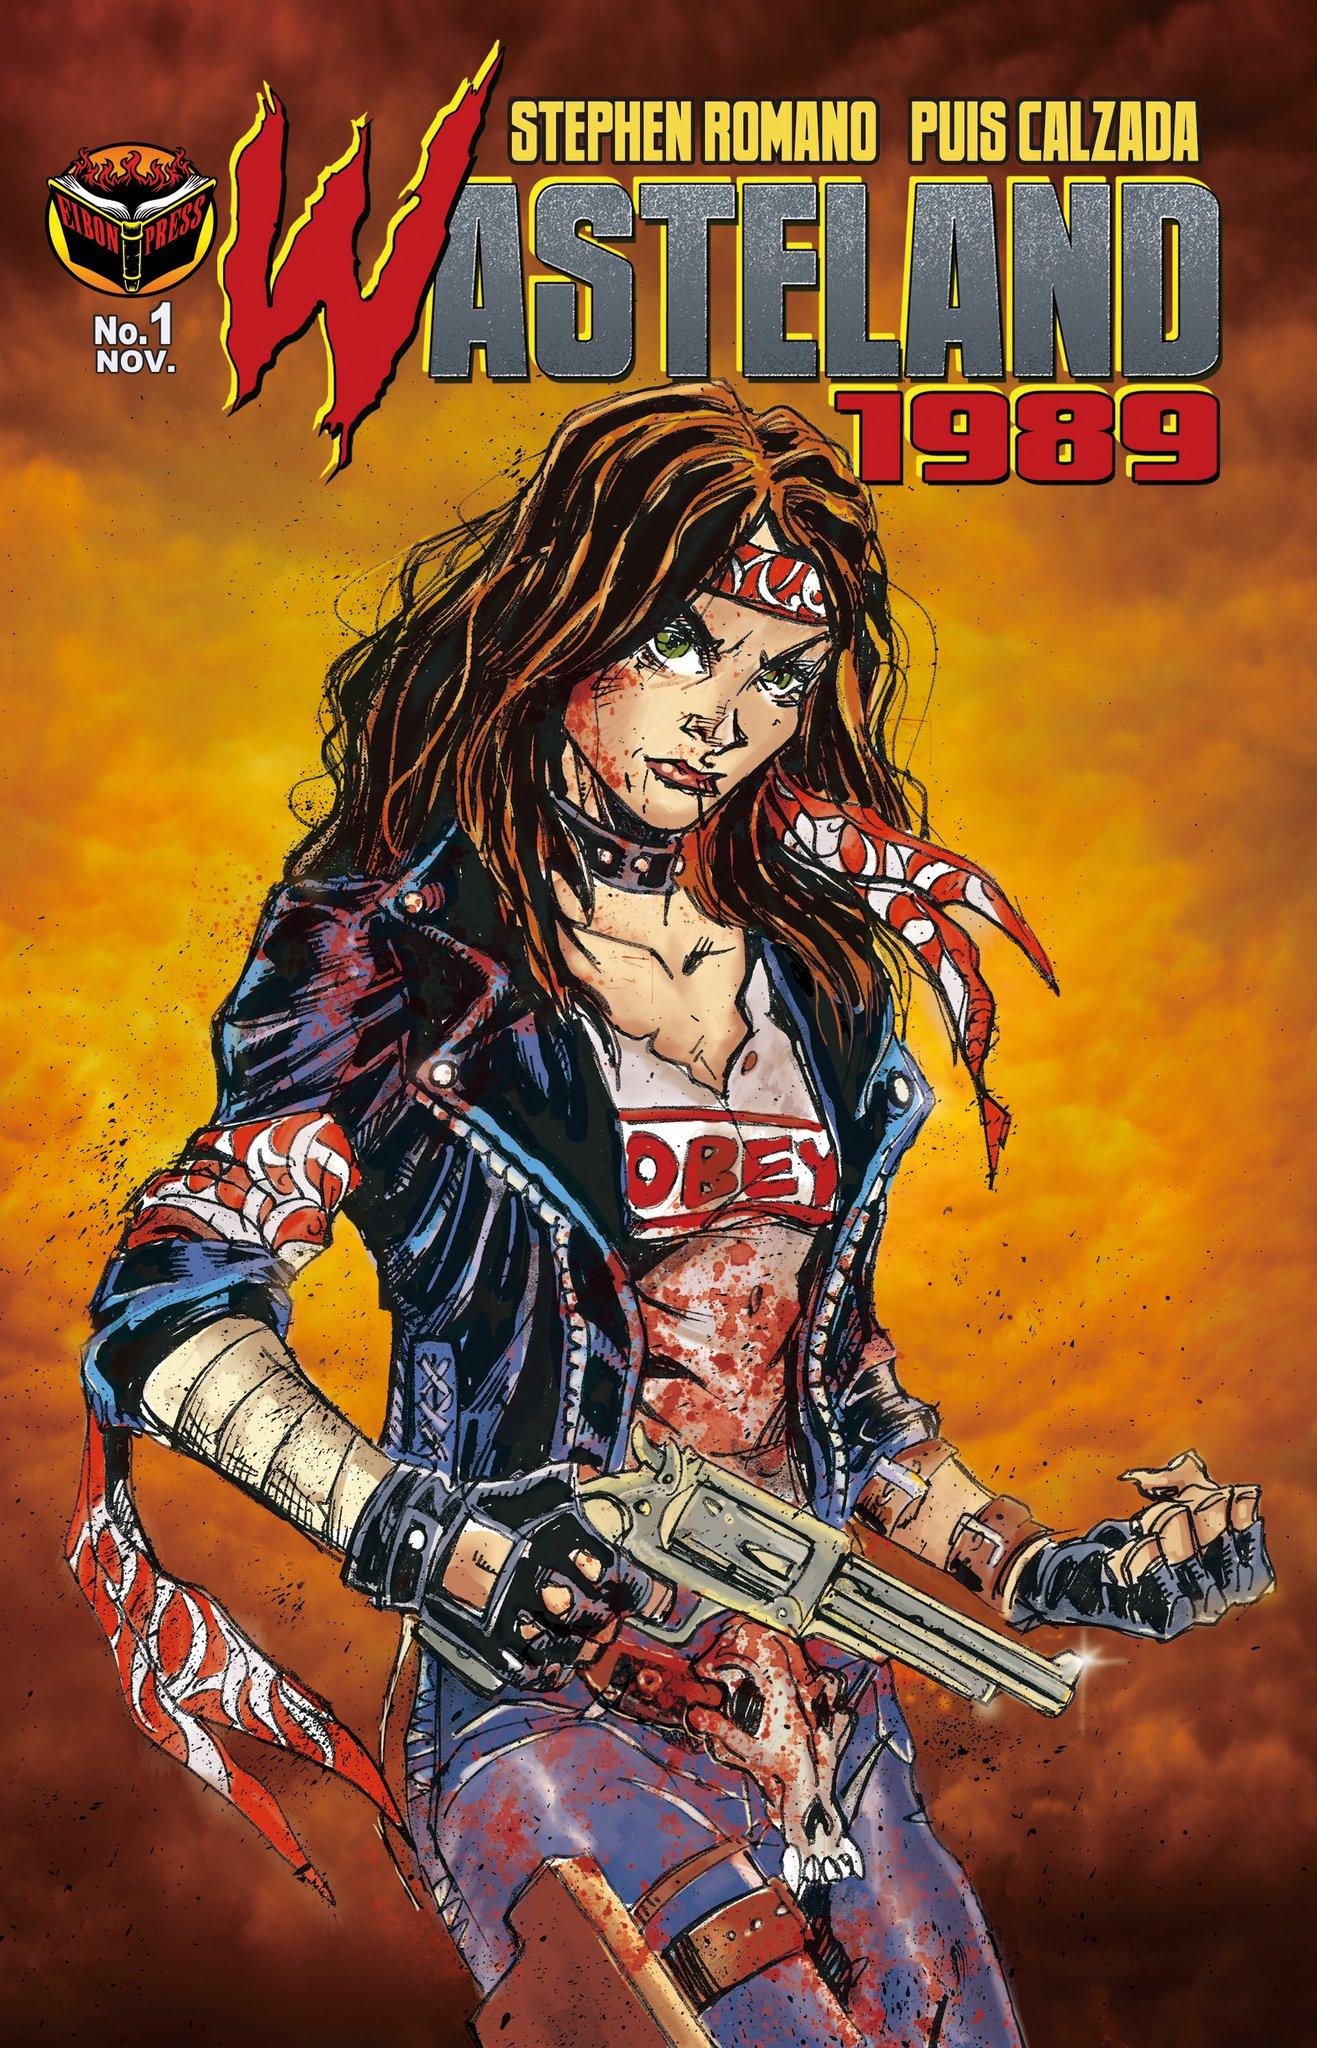 Wasteland 1989, Eibon Press